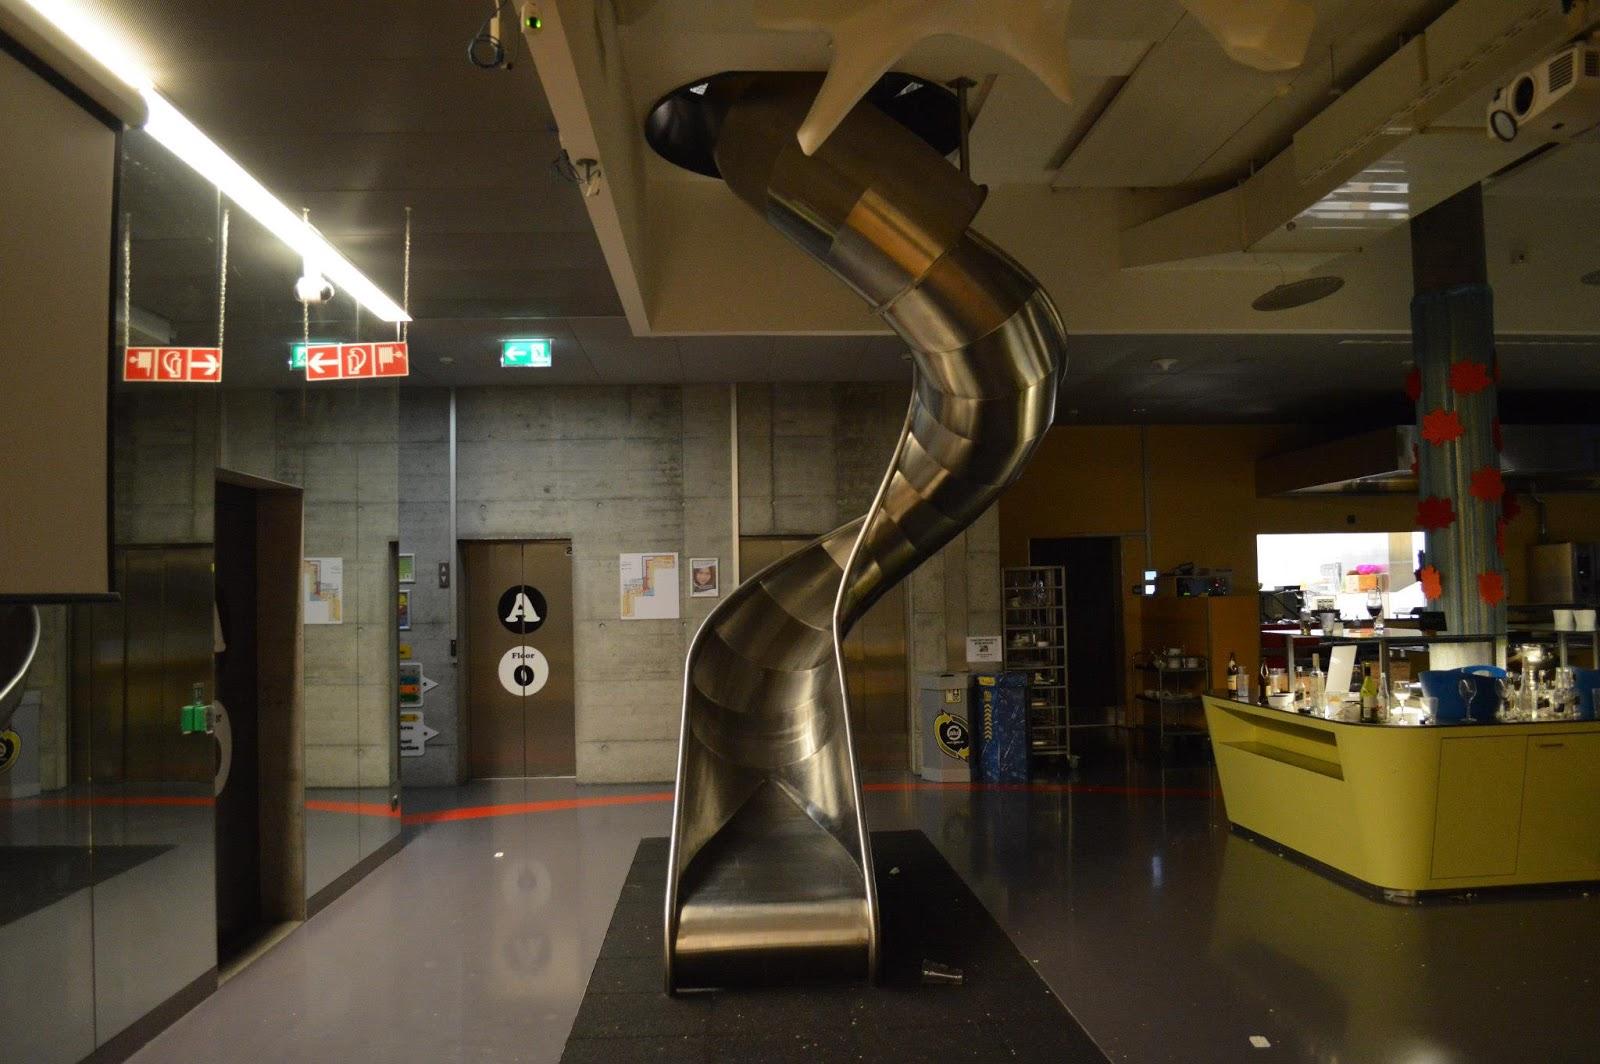 google office switzerland. Slide At Google Office Switzerland B